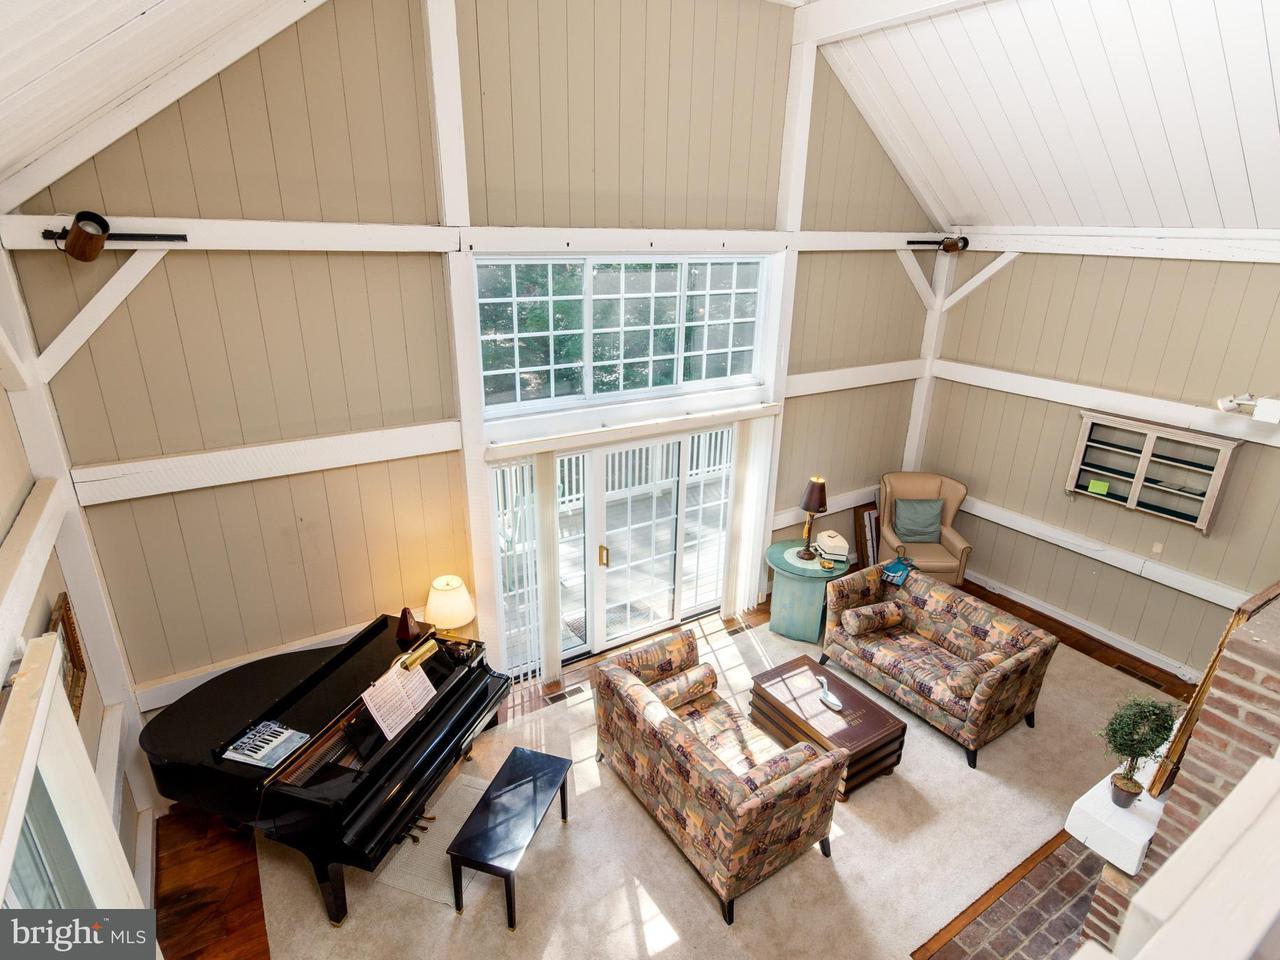 Single Family Home for Sale at 151 GLEN OBAN Drive 151 GLEN OBAN Drive Arnold, Maryland 21012 United States